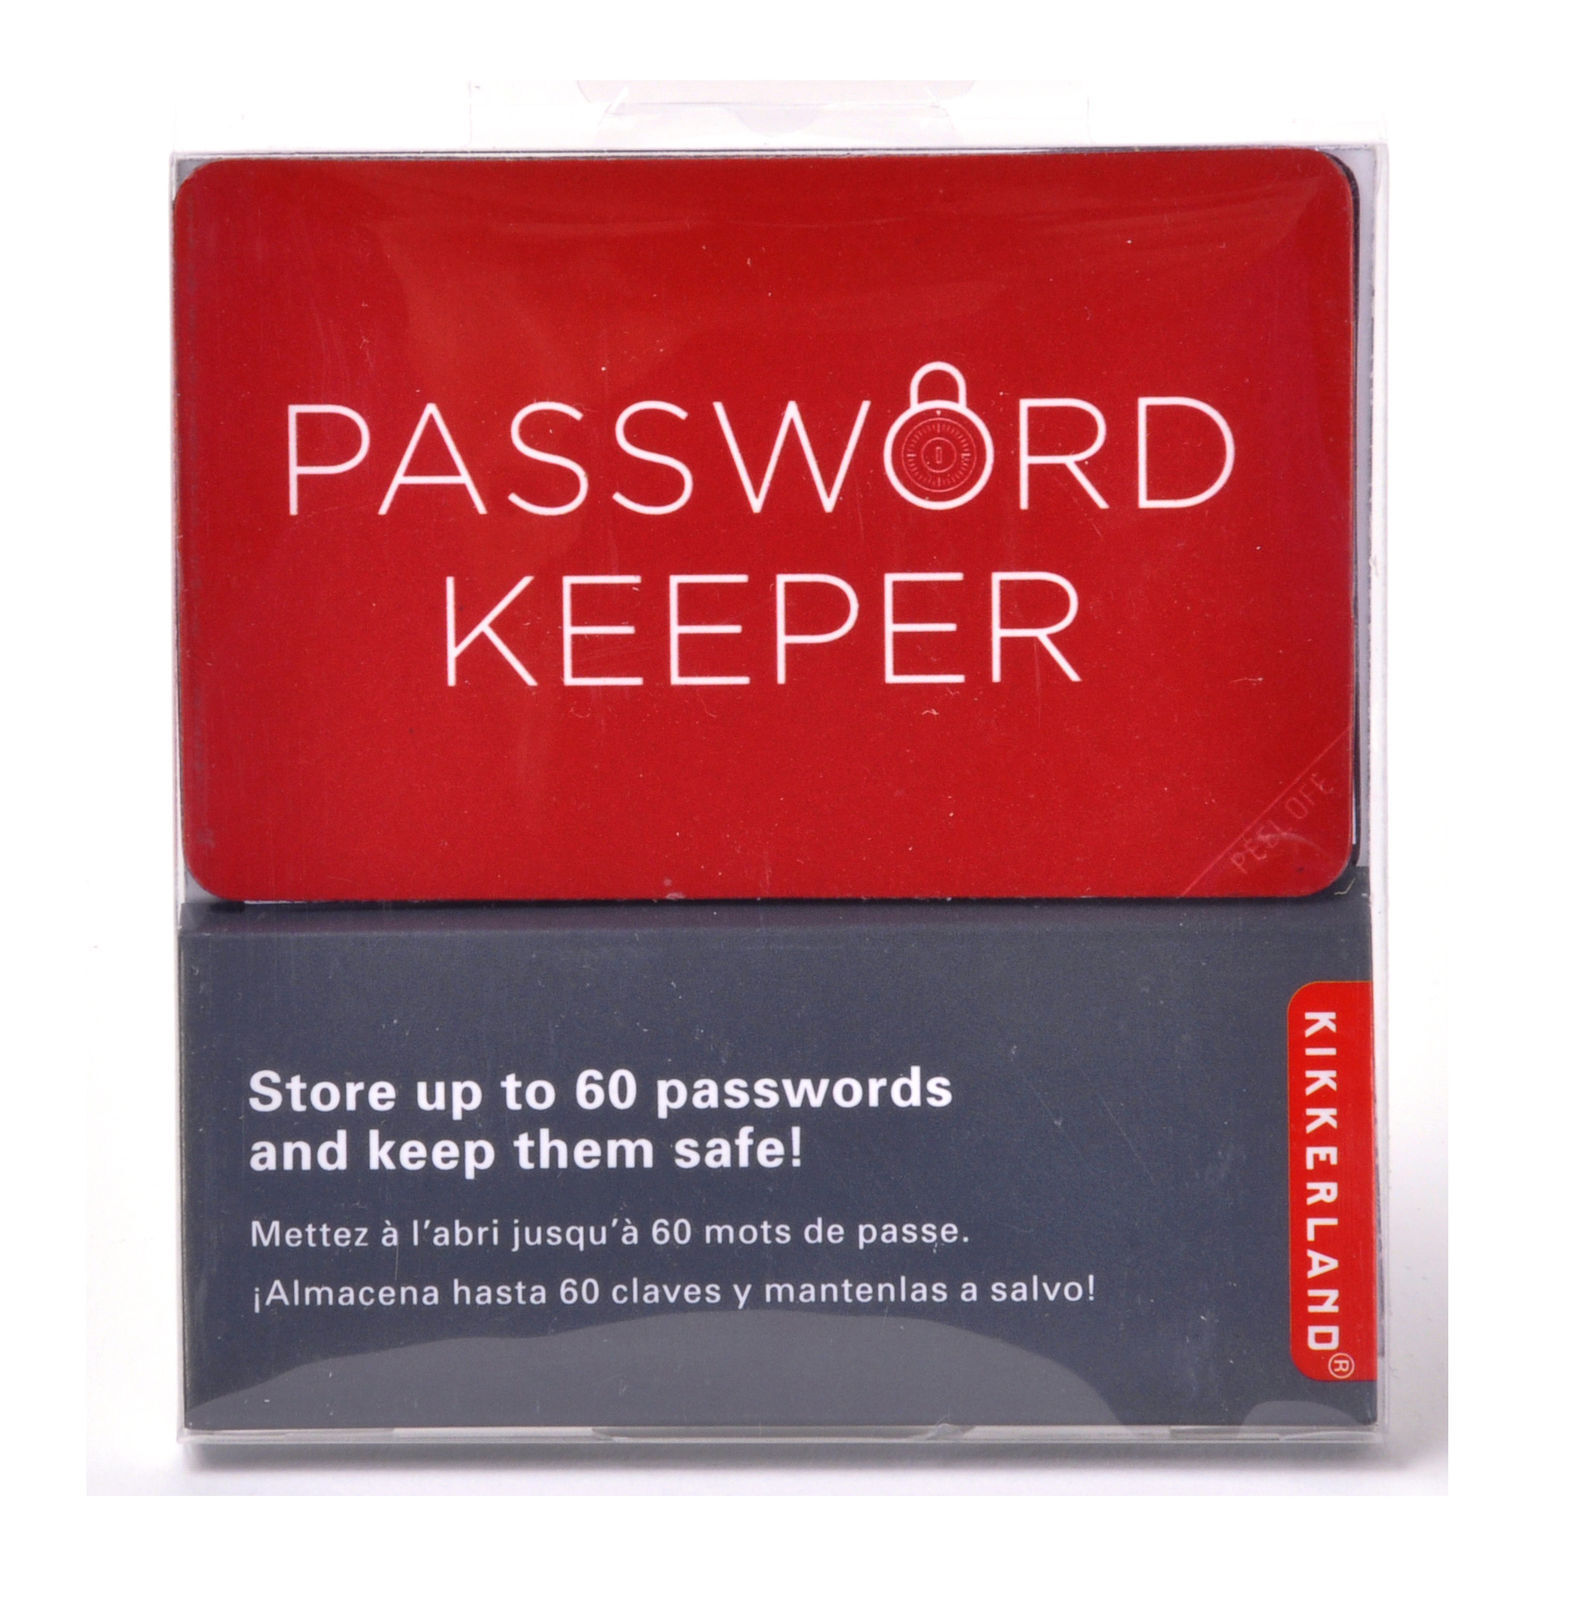 Year Calendar Kikkerland : Nb kikkerland password keeper wallet sized folding book crypto